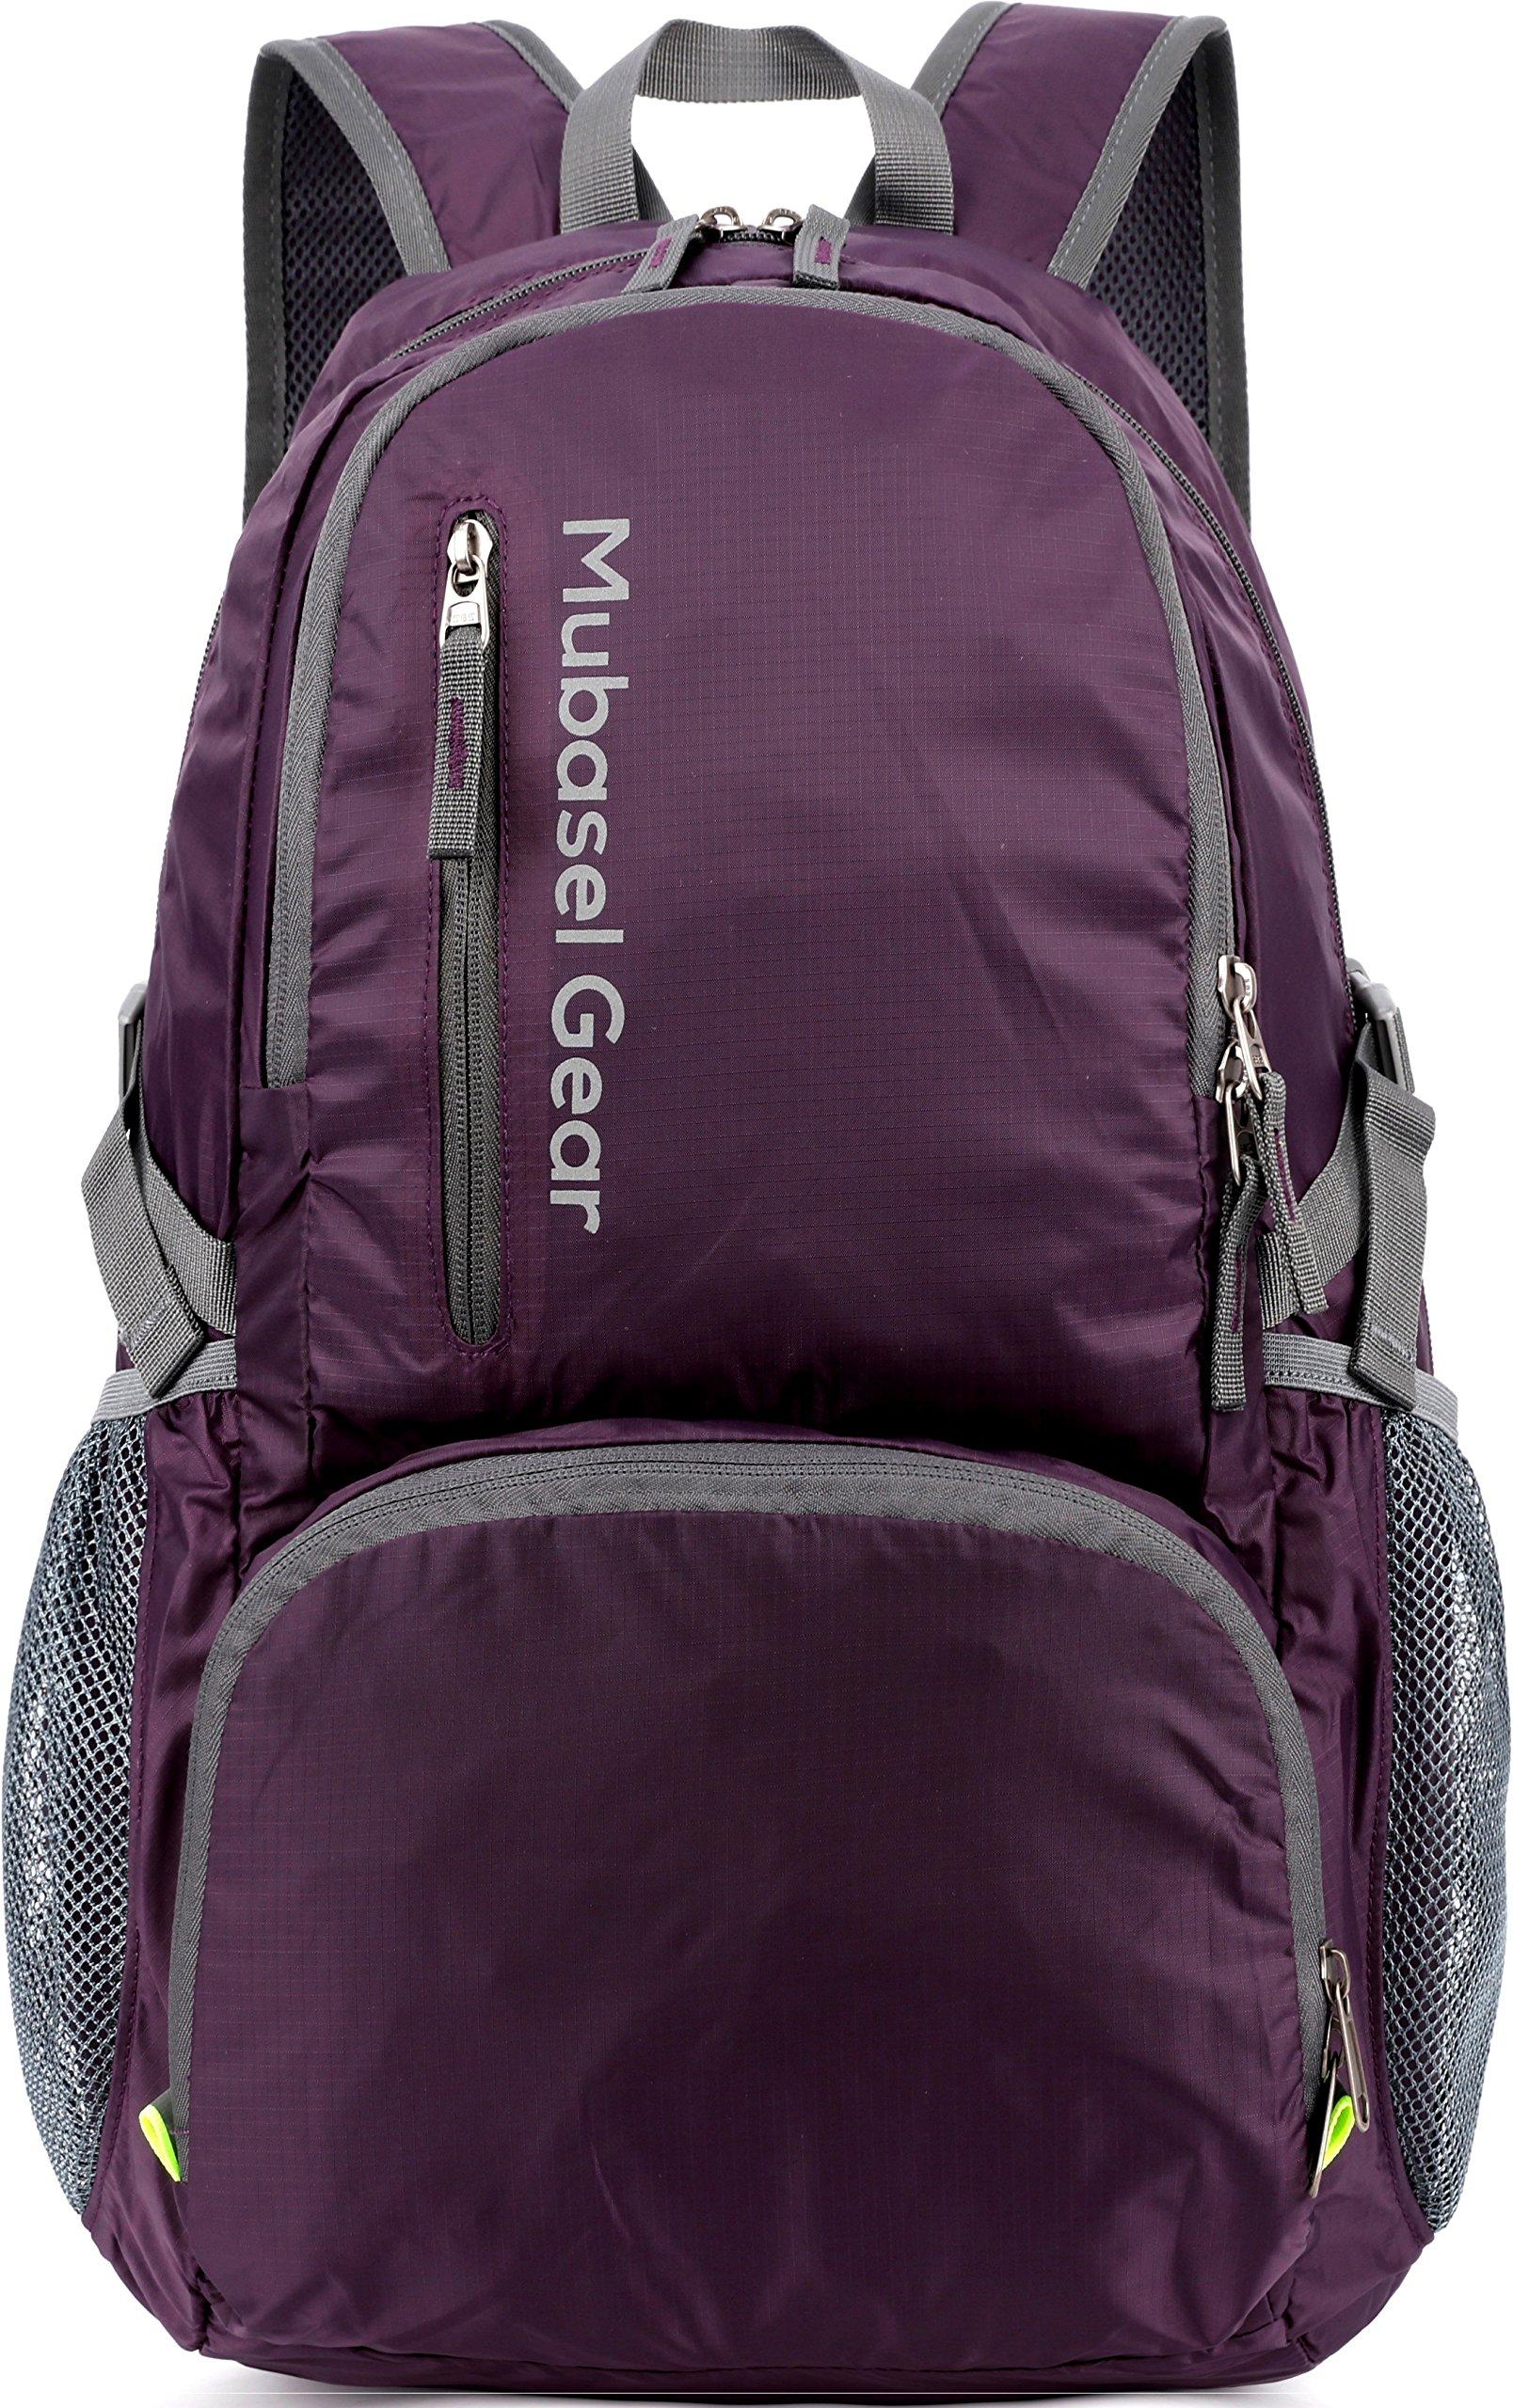 Mubasel Gear Backpack - Lightweight Backpacks for Travel Hiking - Daypack for Women Men (Purple) by Mubasel Gear (Image #1)